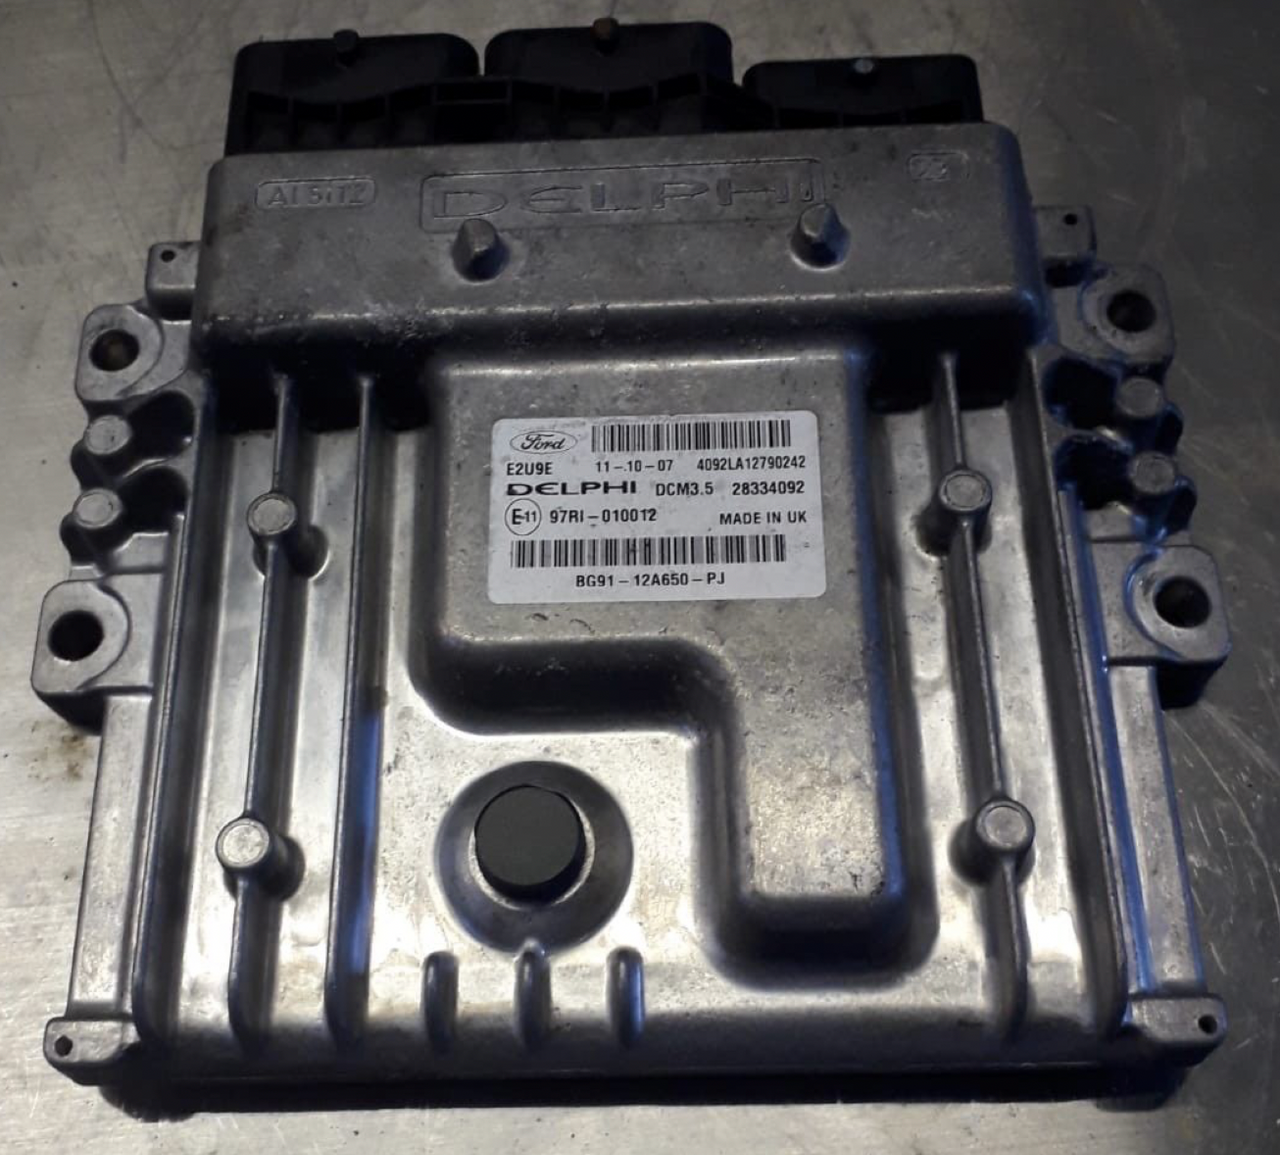 Ford, BG91-12A650-PJ, 28334092, DCM3.5